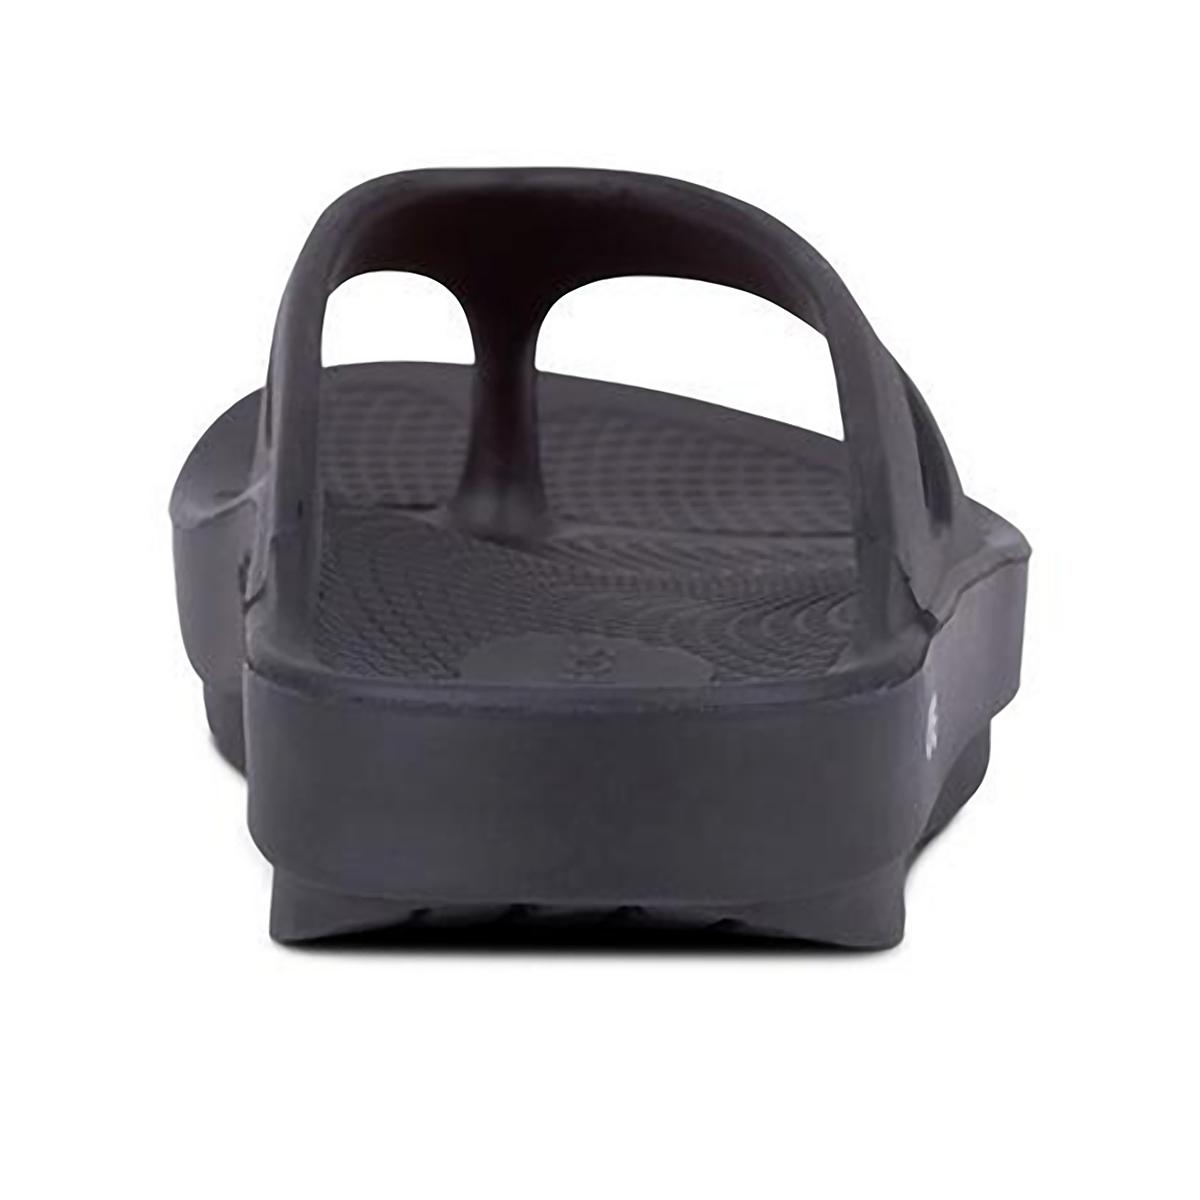 Oofos OOriginal Recovery Sandal - Color: Black - Size: M3/W5 - Width: Regular, Black, large, image 4